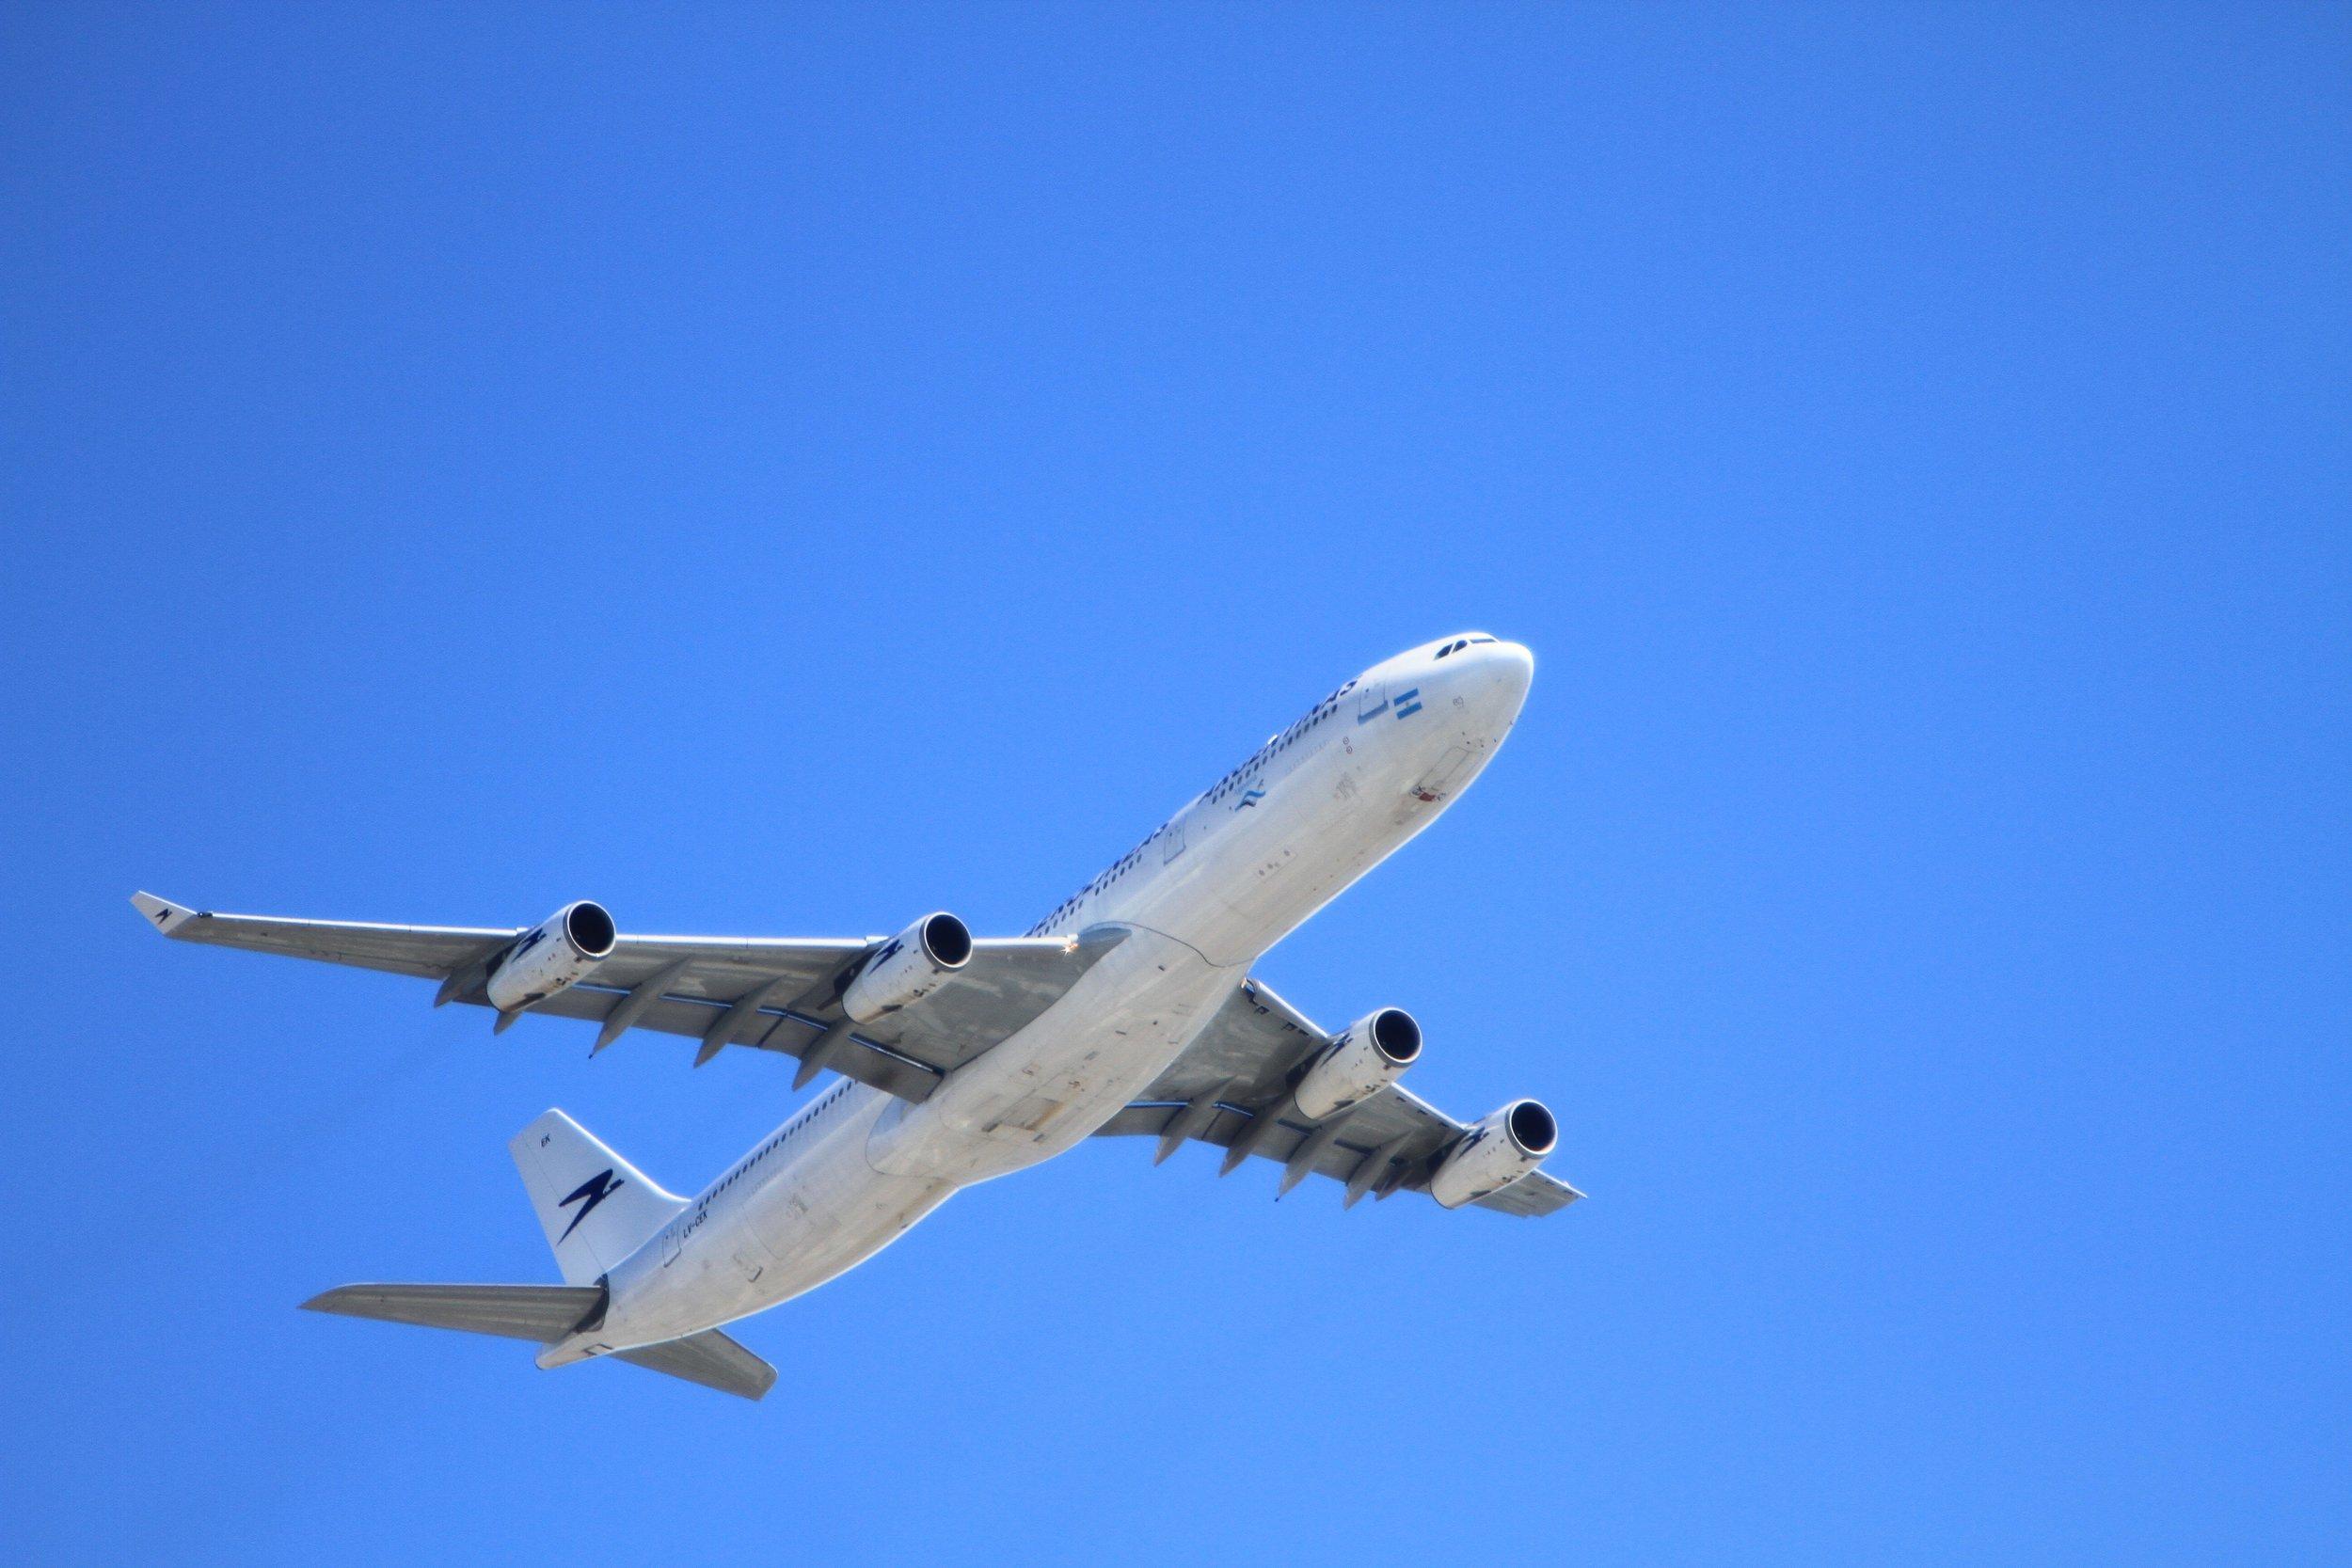 aeroplane-aircraft-airplane-67807.jpg